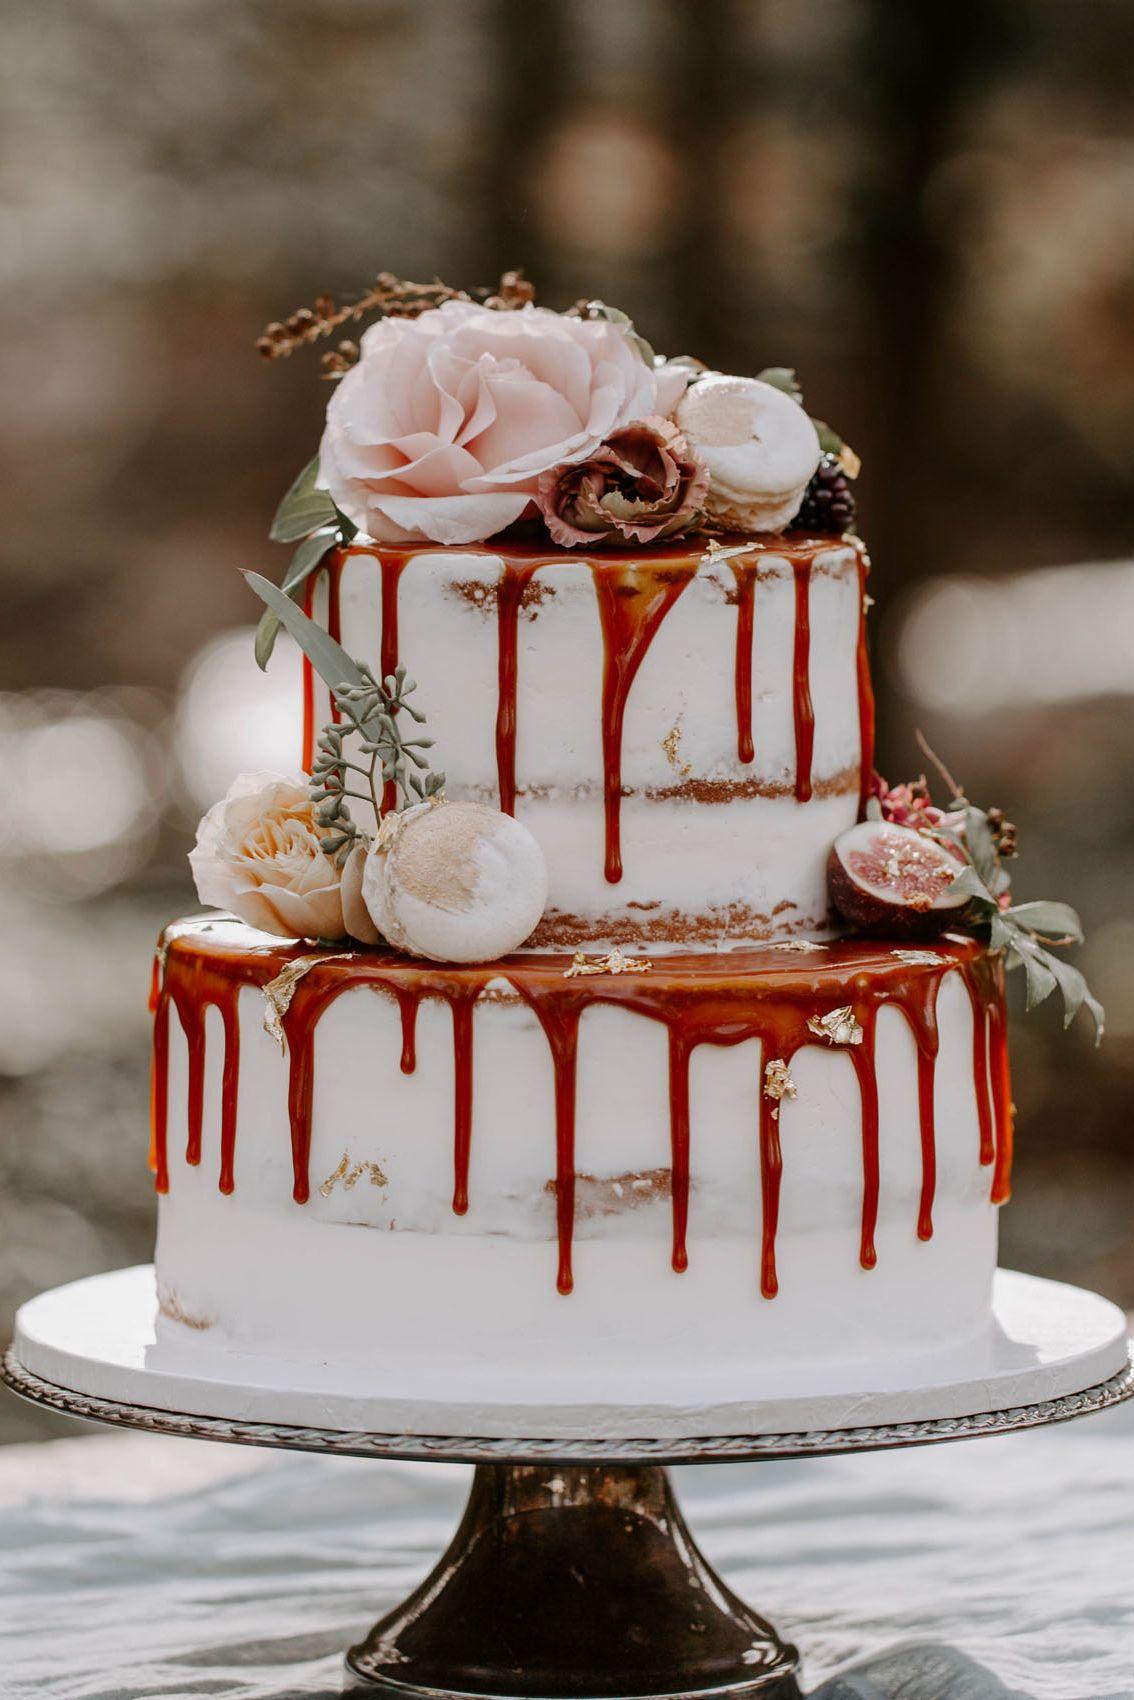 22 Decadent Fall Wedding Cakes - Gorgeous Fall Wedding Cake ...